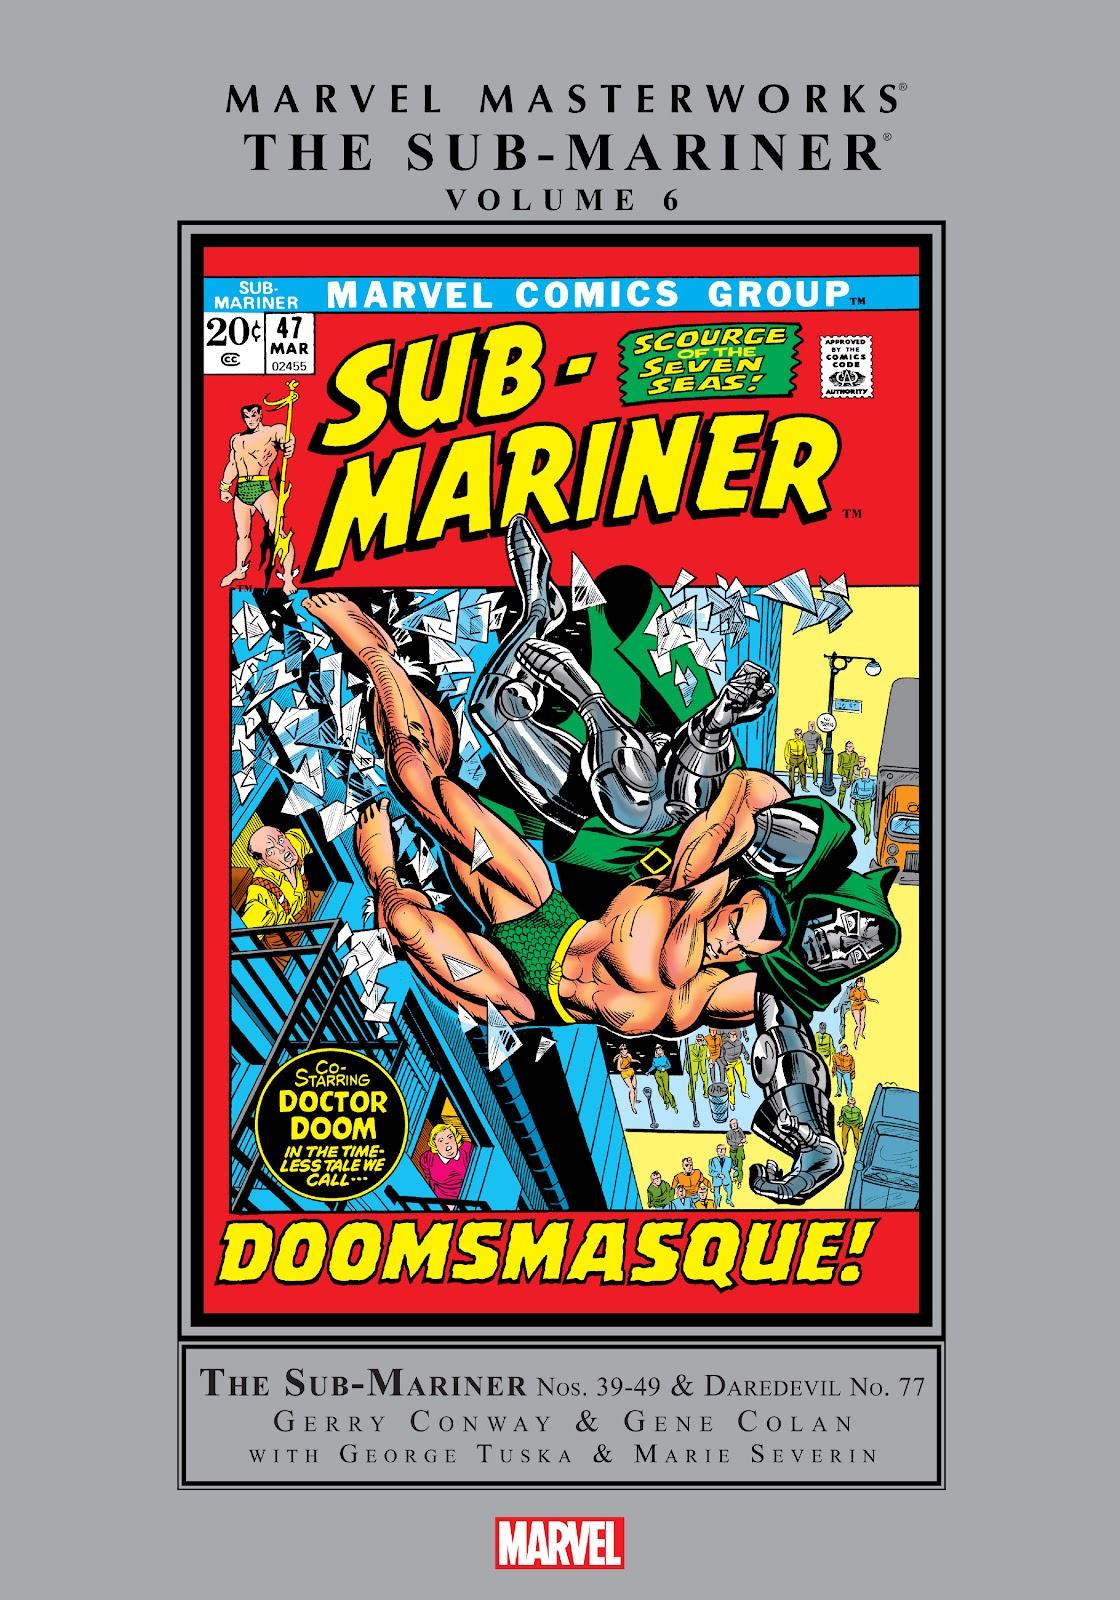 Marvel Masterworks: The Sub-Mariner TPB_6_(Part_1) Page 1